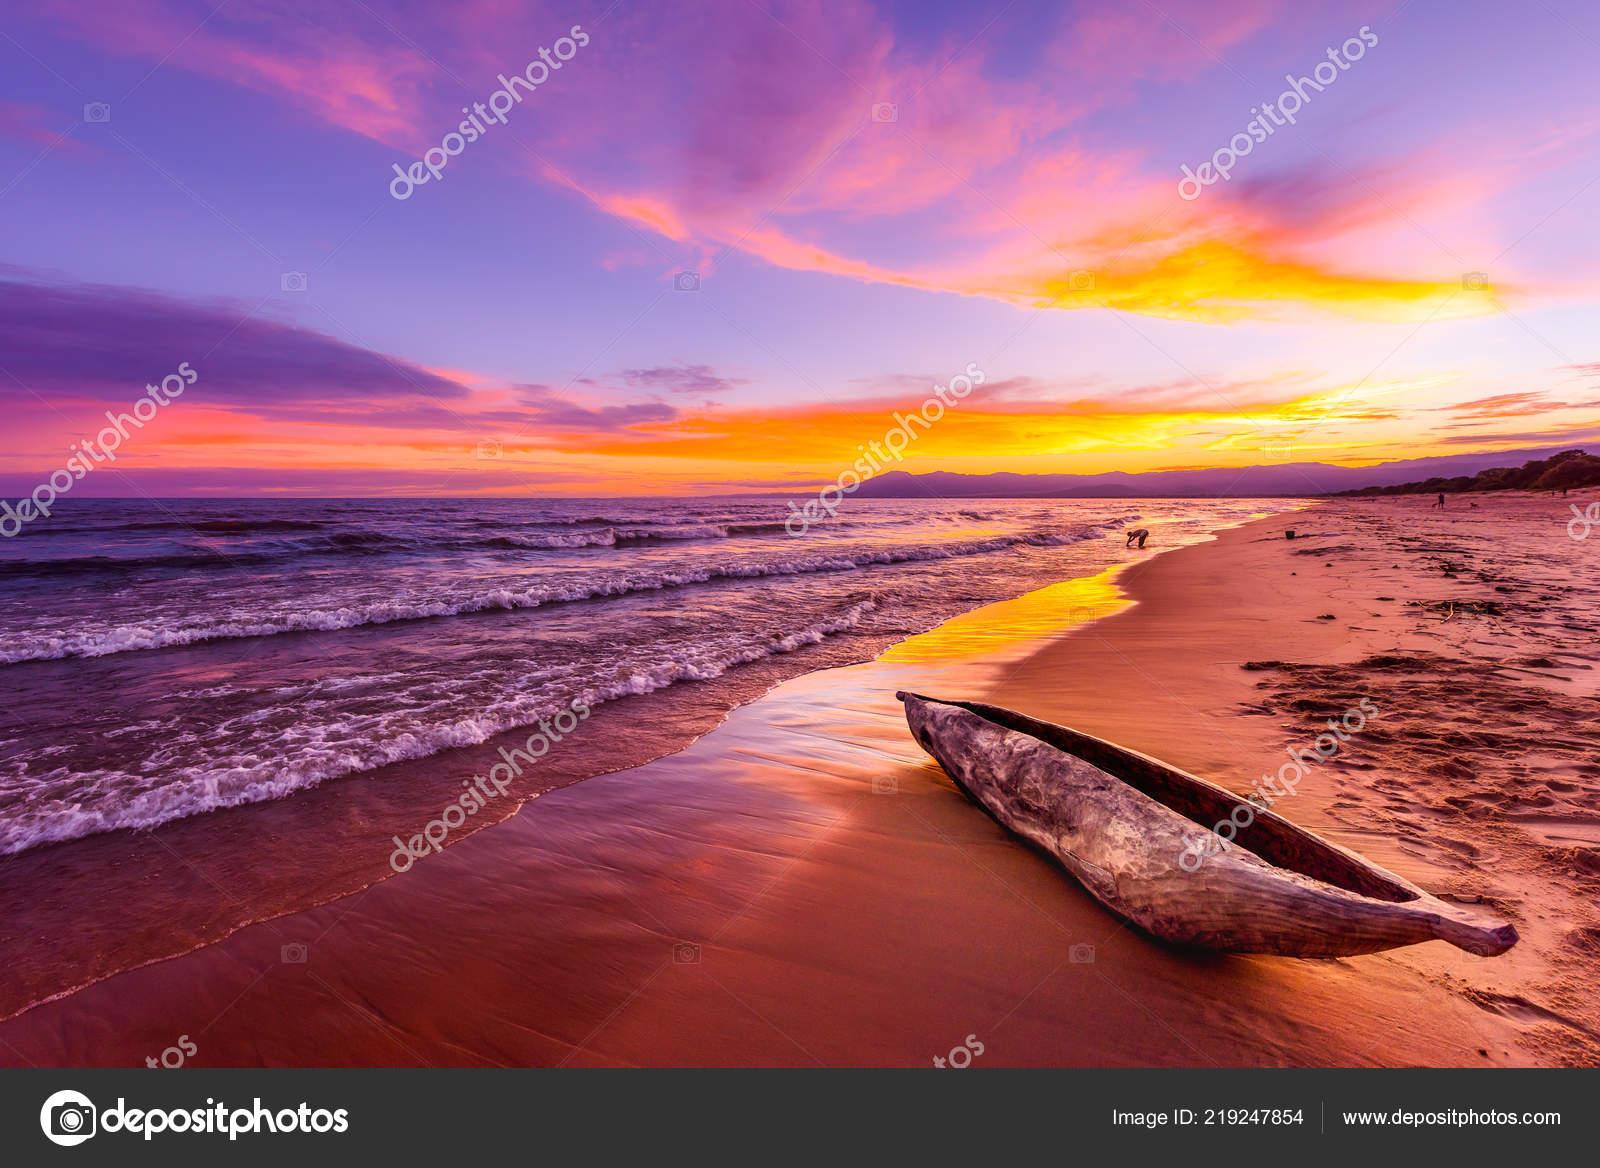 lake malawi sunset kande beach africa canoe boat beach peaceful